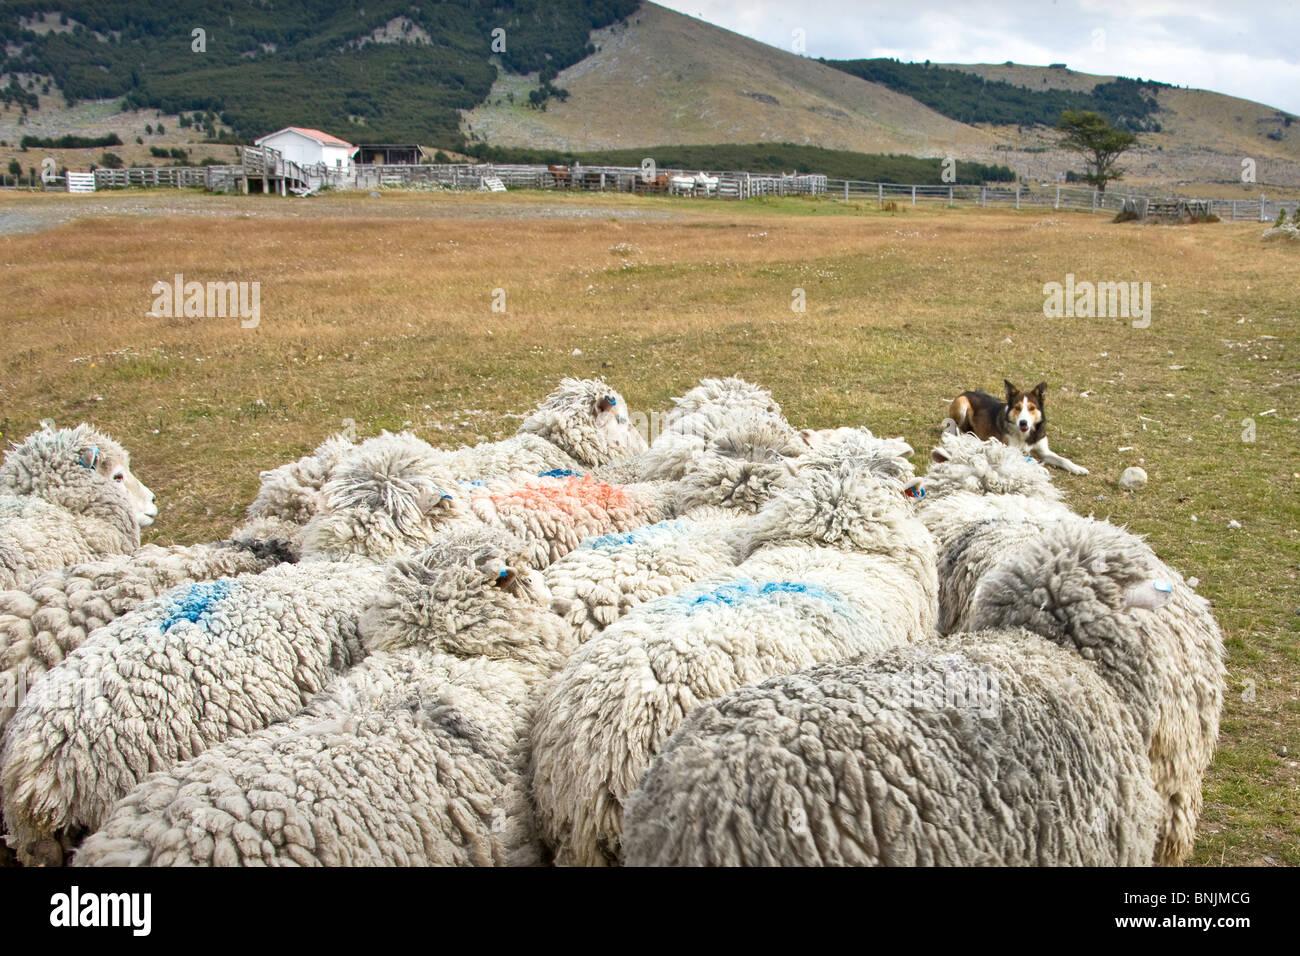 Chile South America March 2009 Chilean Patagonia Estancia Cerro Negro animals agriculture farming wool shepherd - Stock Image